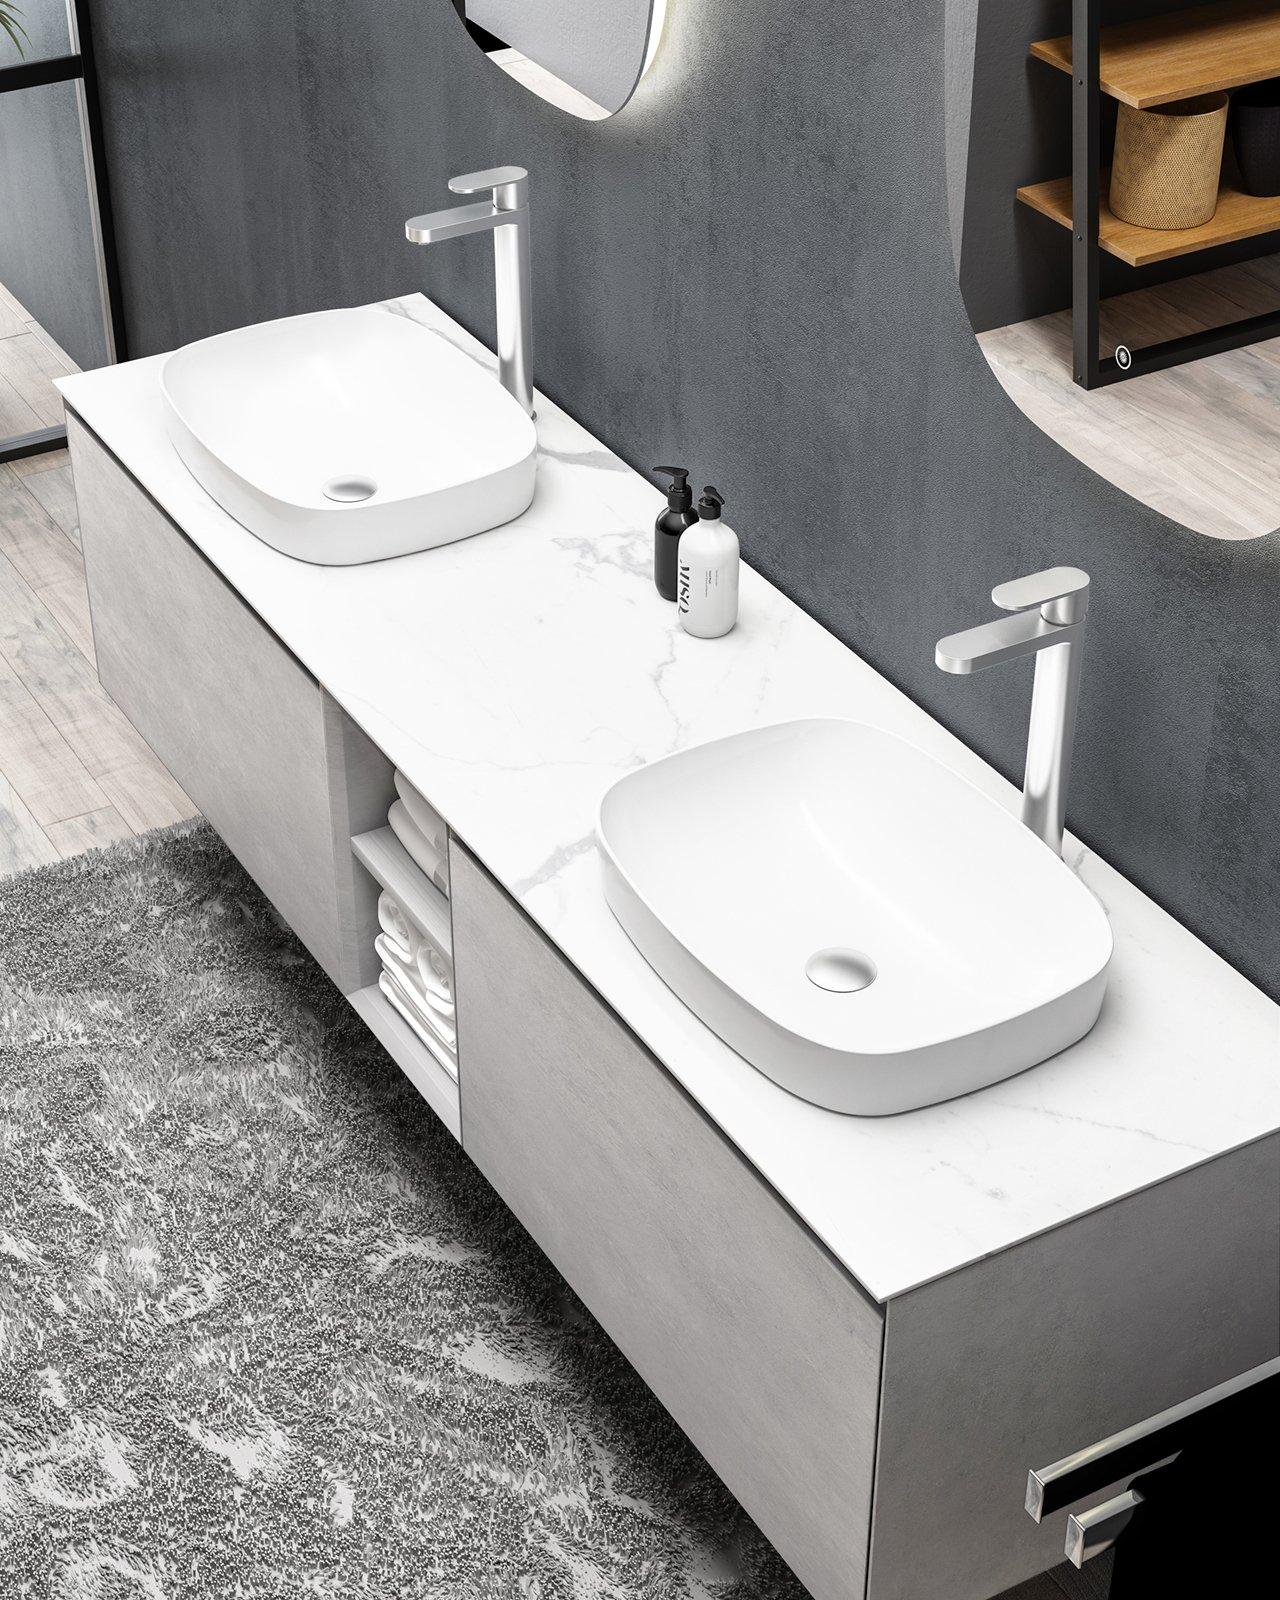 Badmöbel-Set INALCO 1900 Beton-Optik - Spiegel optional